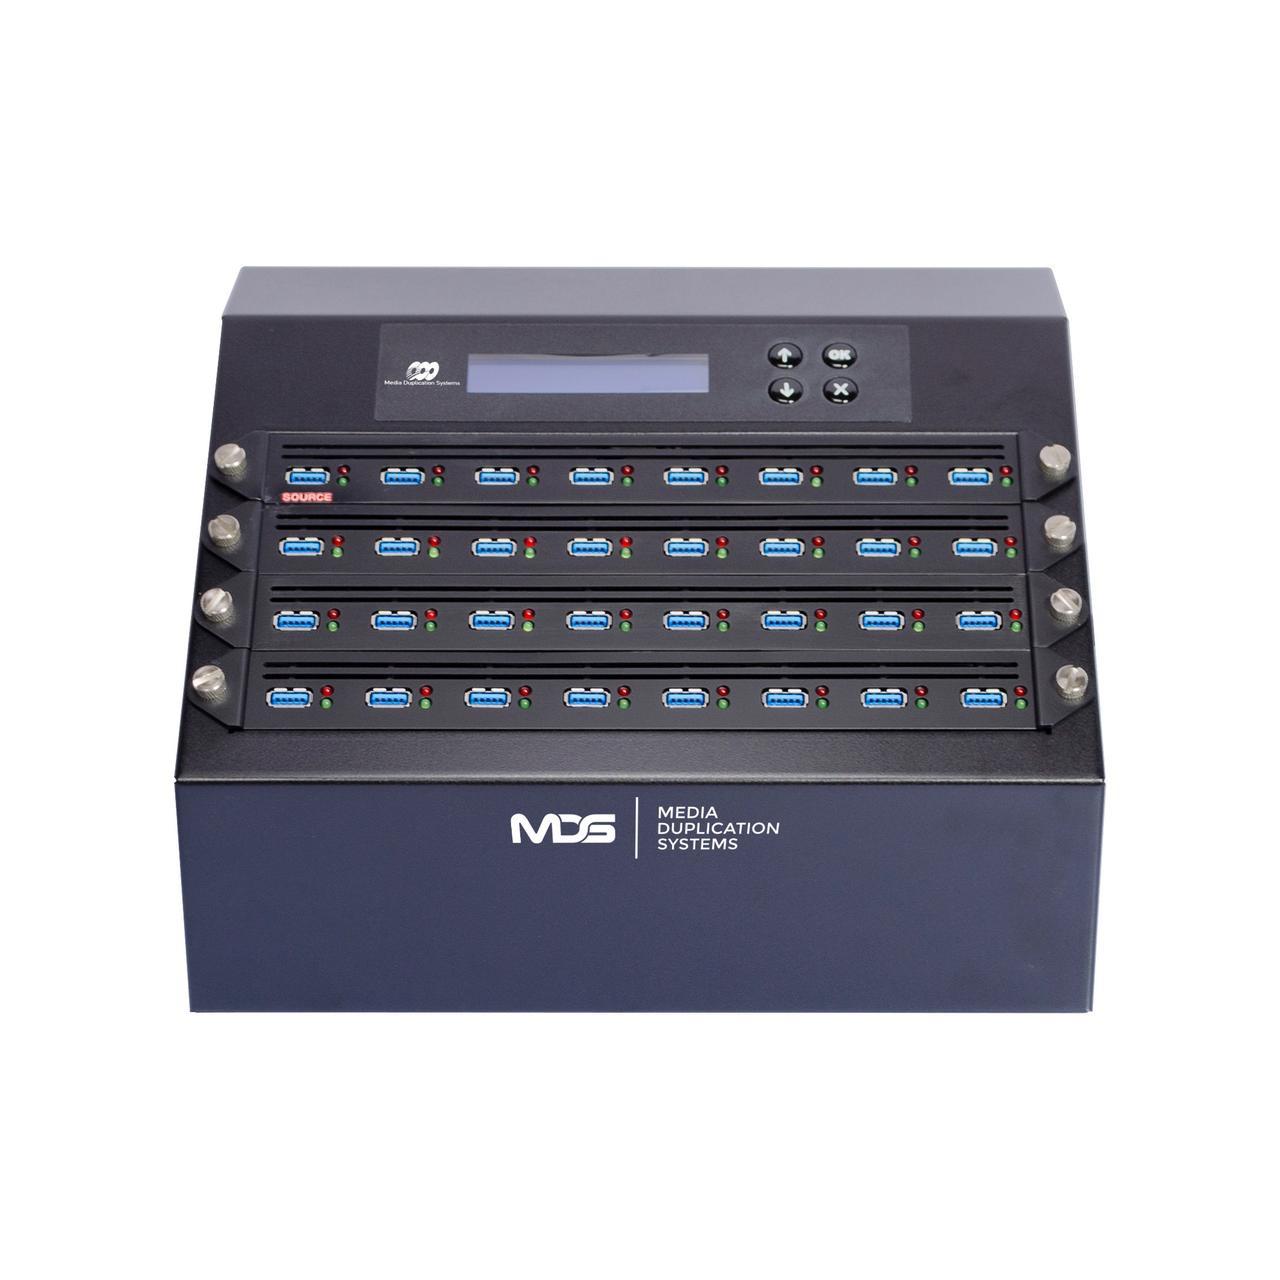 XpressHDD-ULTRA 1-to-31 Copier